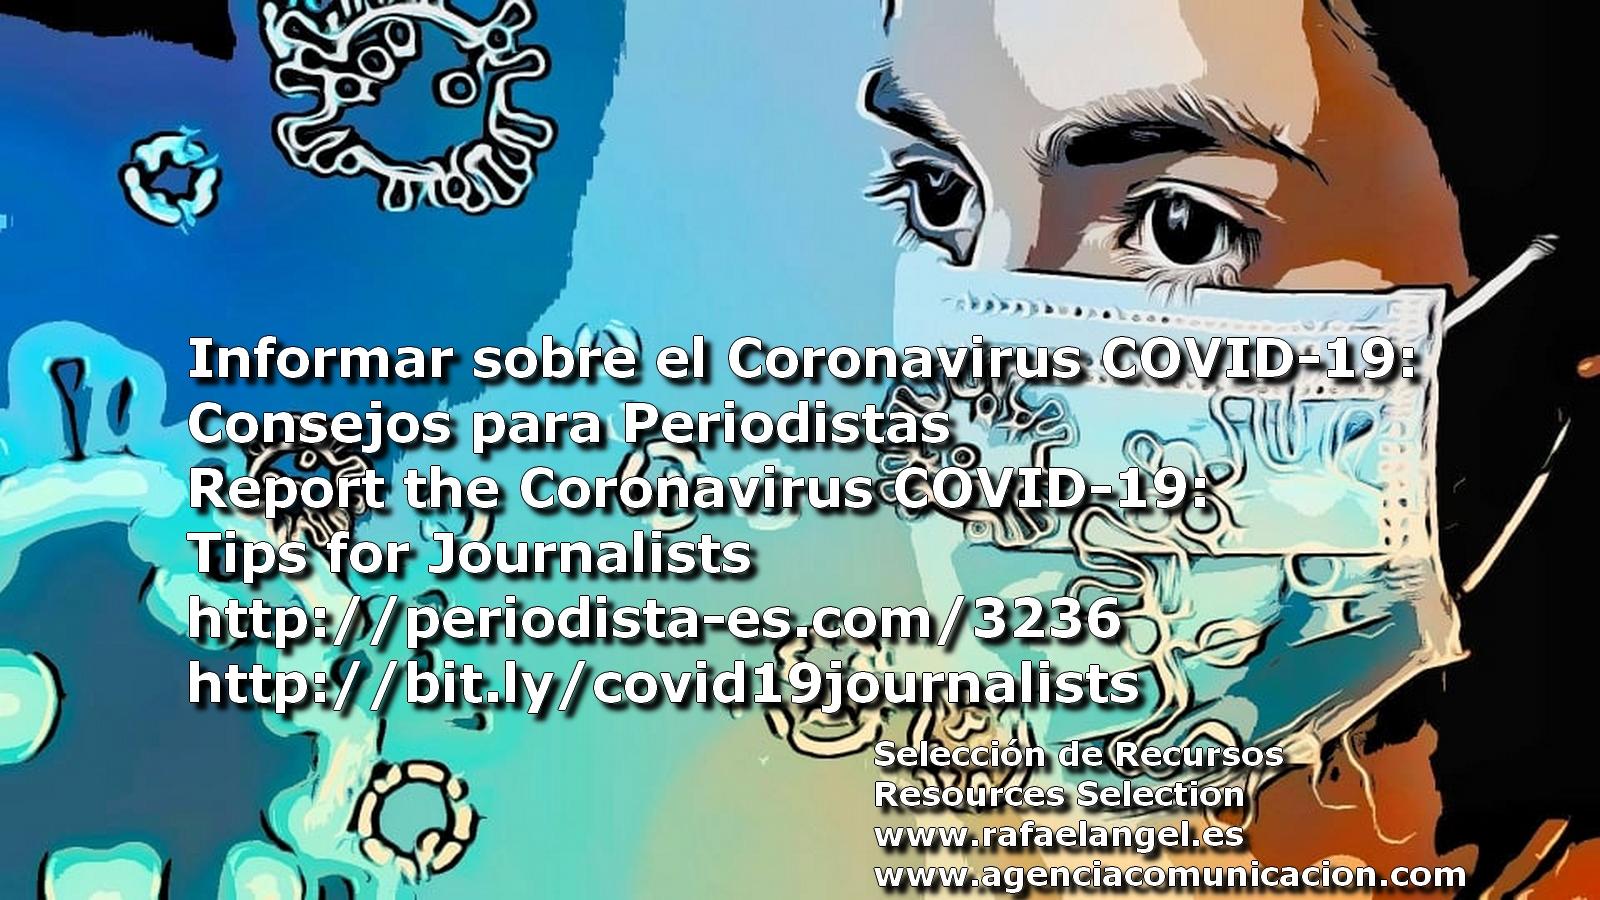 Informar sobre el Coronavirus COVID-19: Consejos para Periodistas . Report the Coronavirus COVID-19: Tips for Journalists